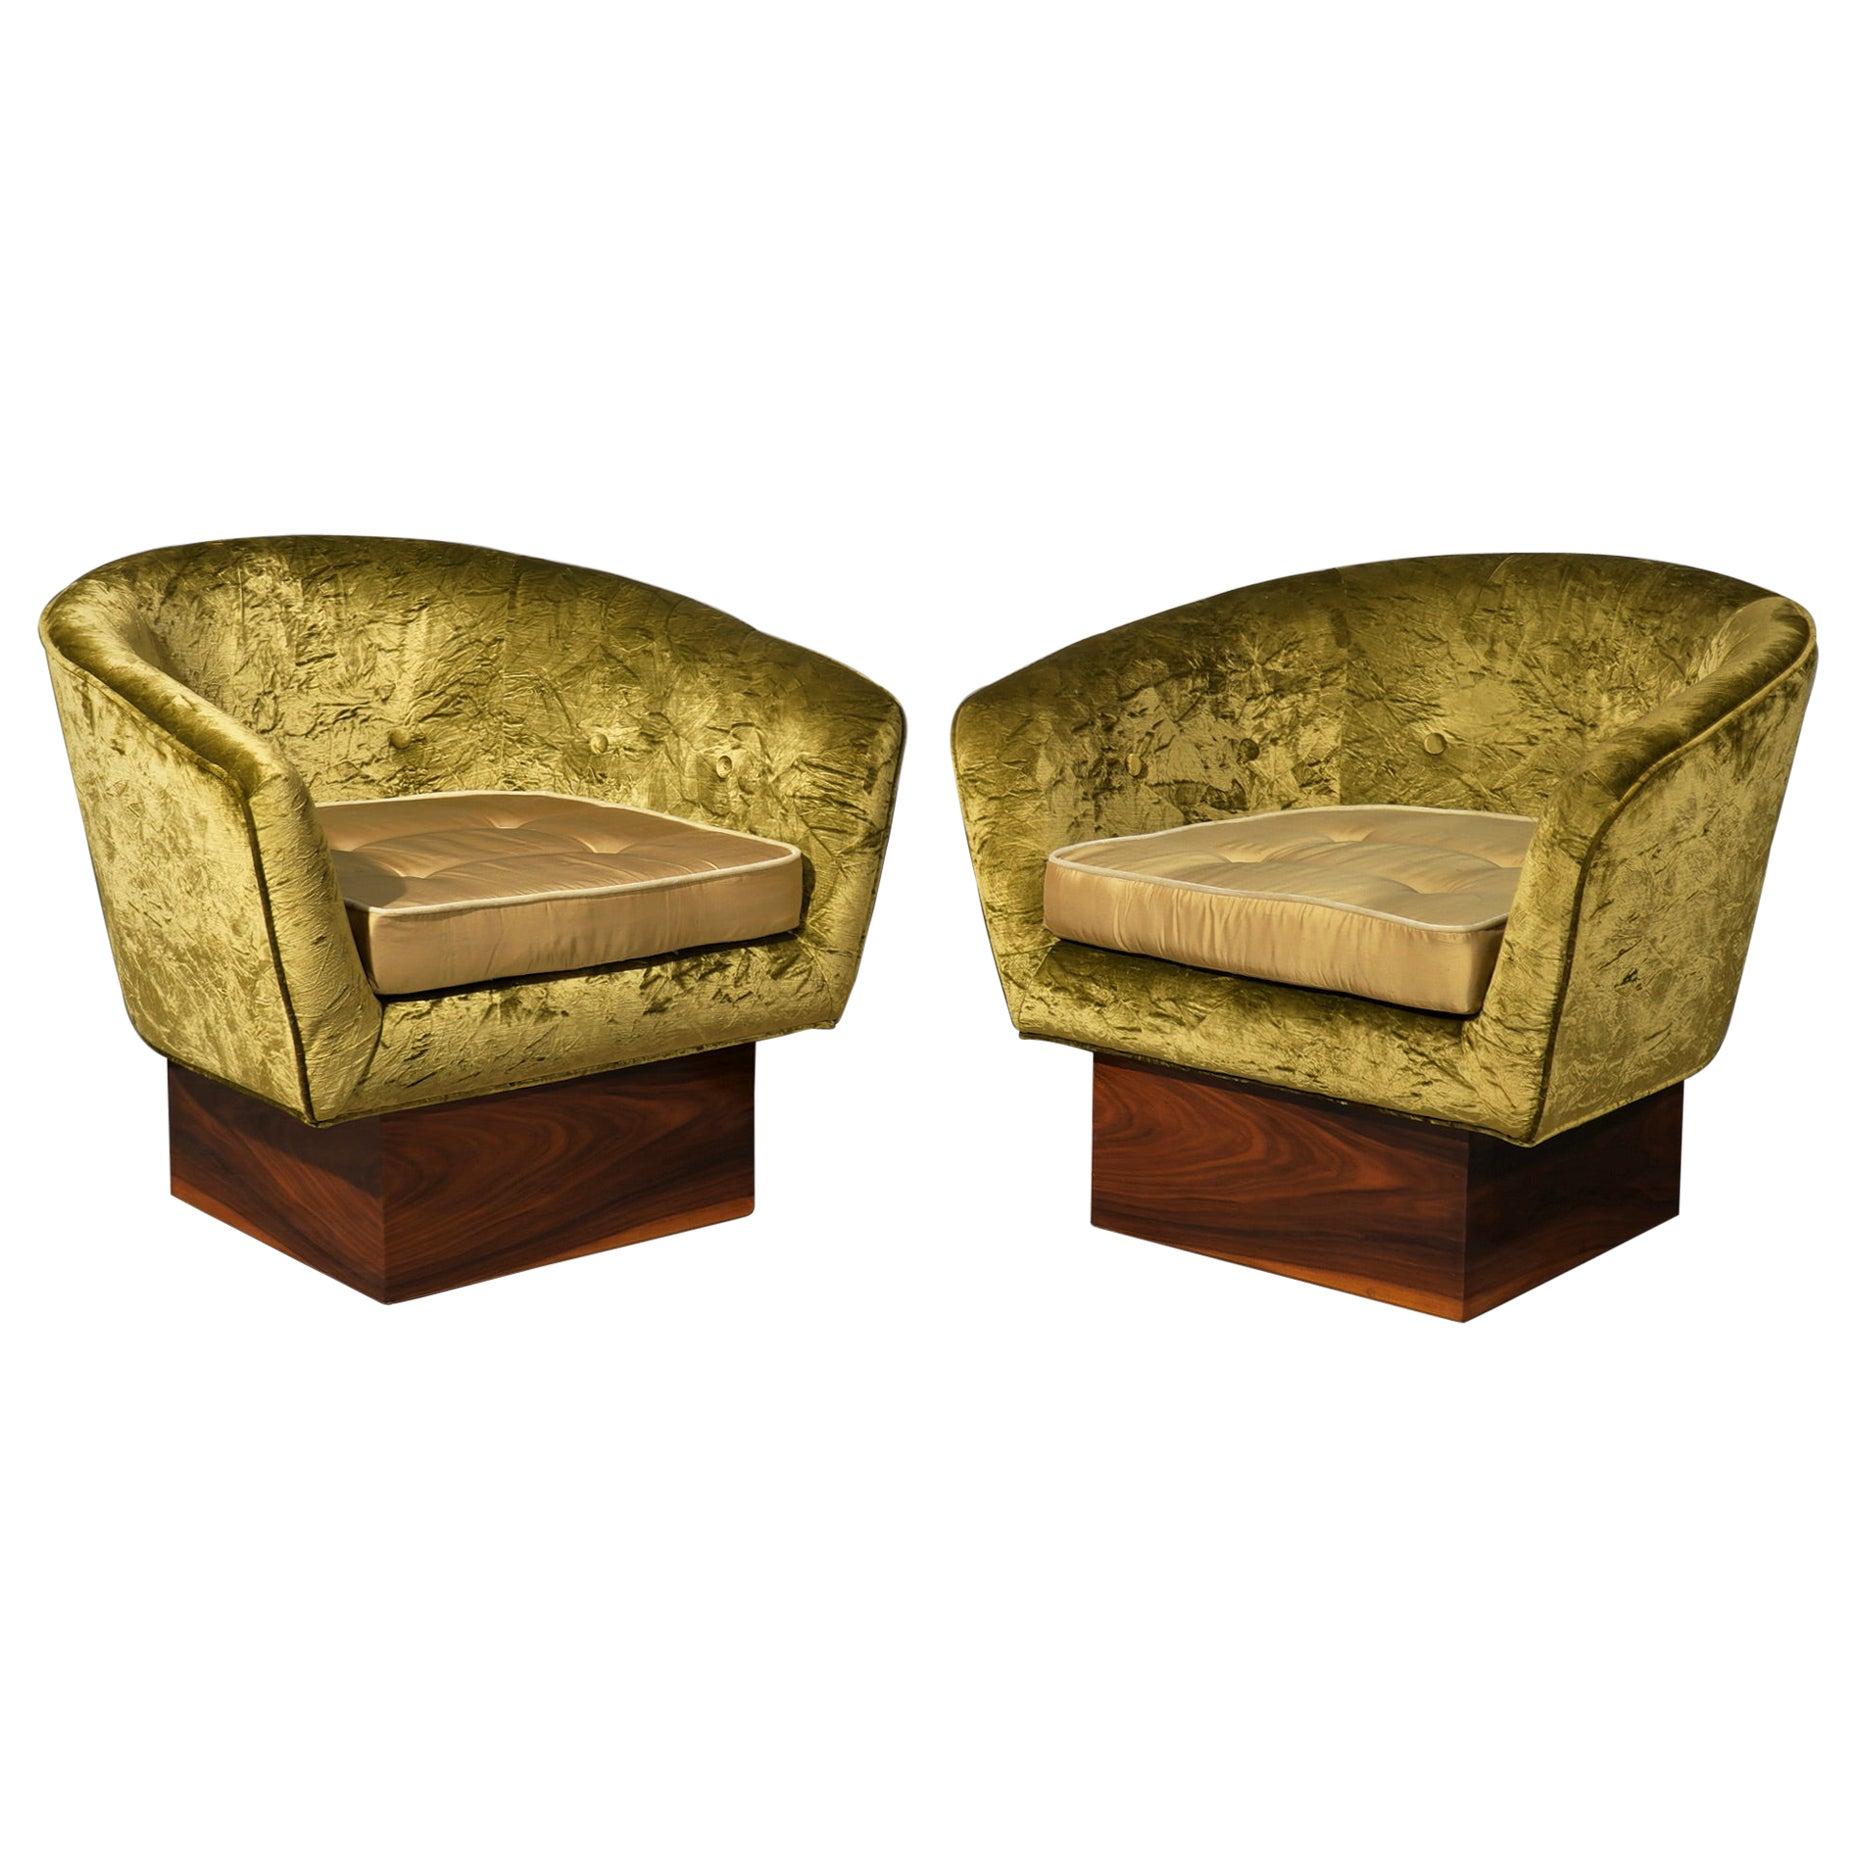 Art Deco Green Velvet and Walnut Wood Basis Italian Armchairs, 1940